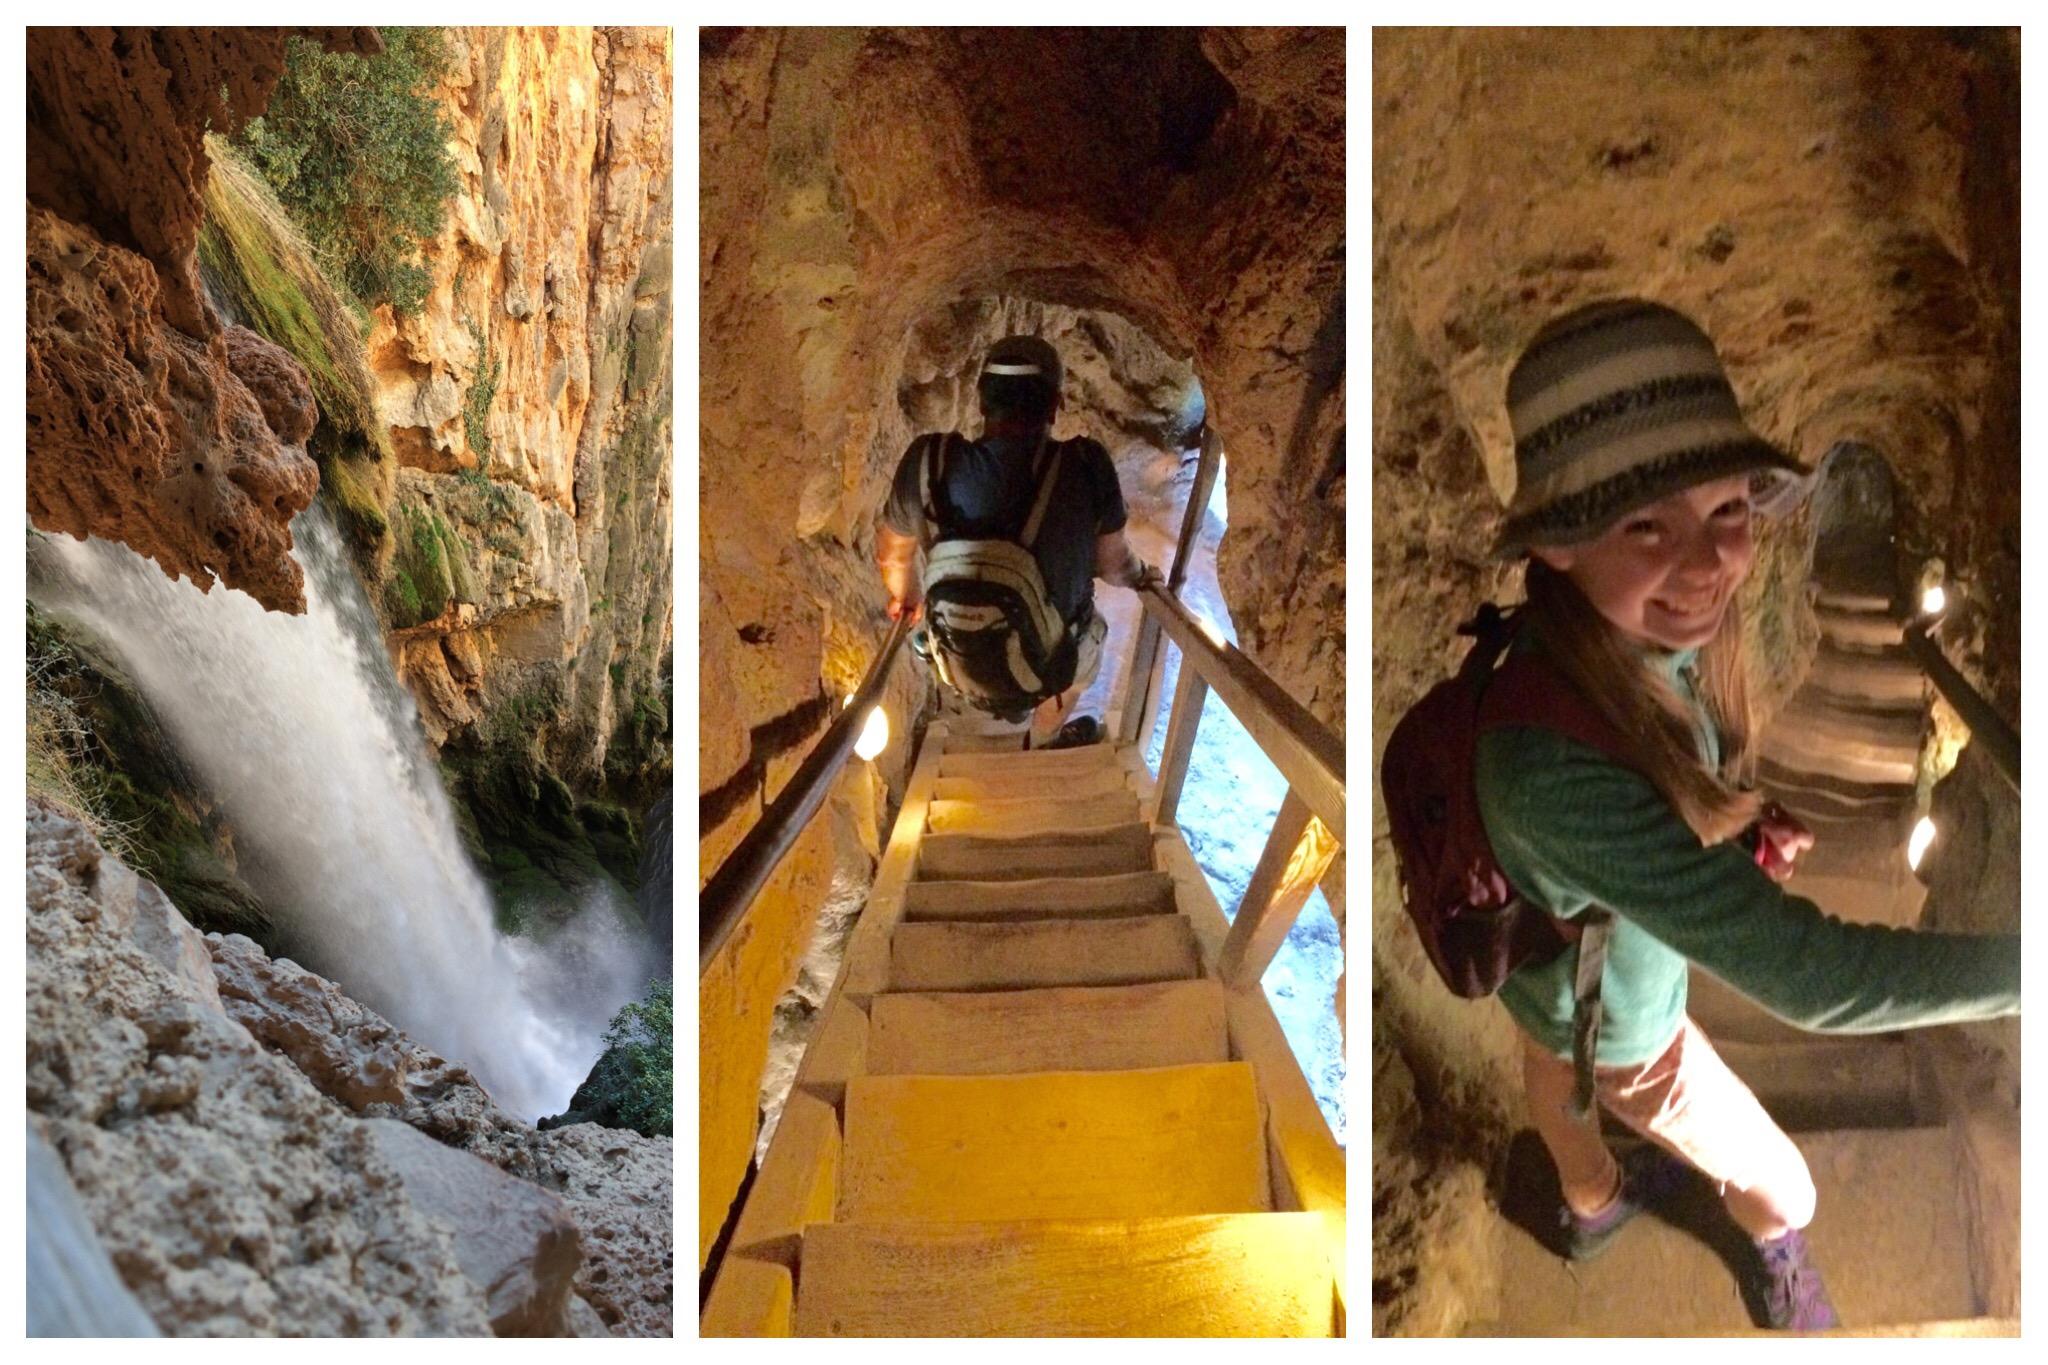 Monasterio de Piedra Descending into the Iris cavern